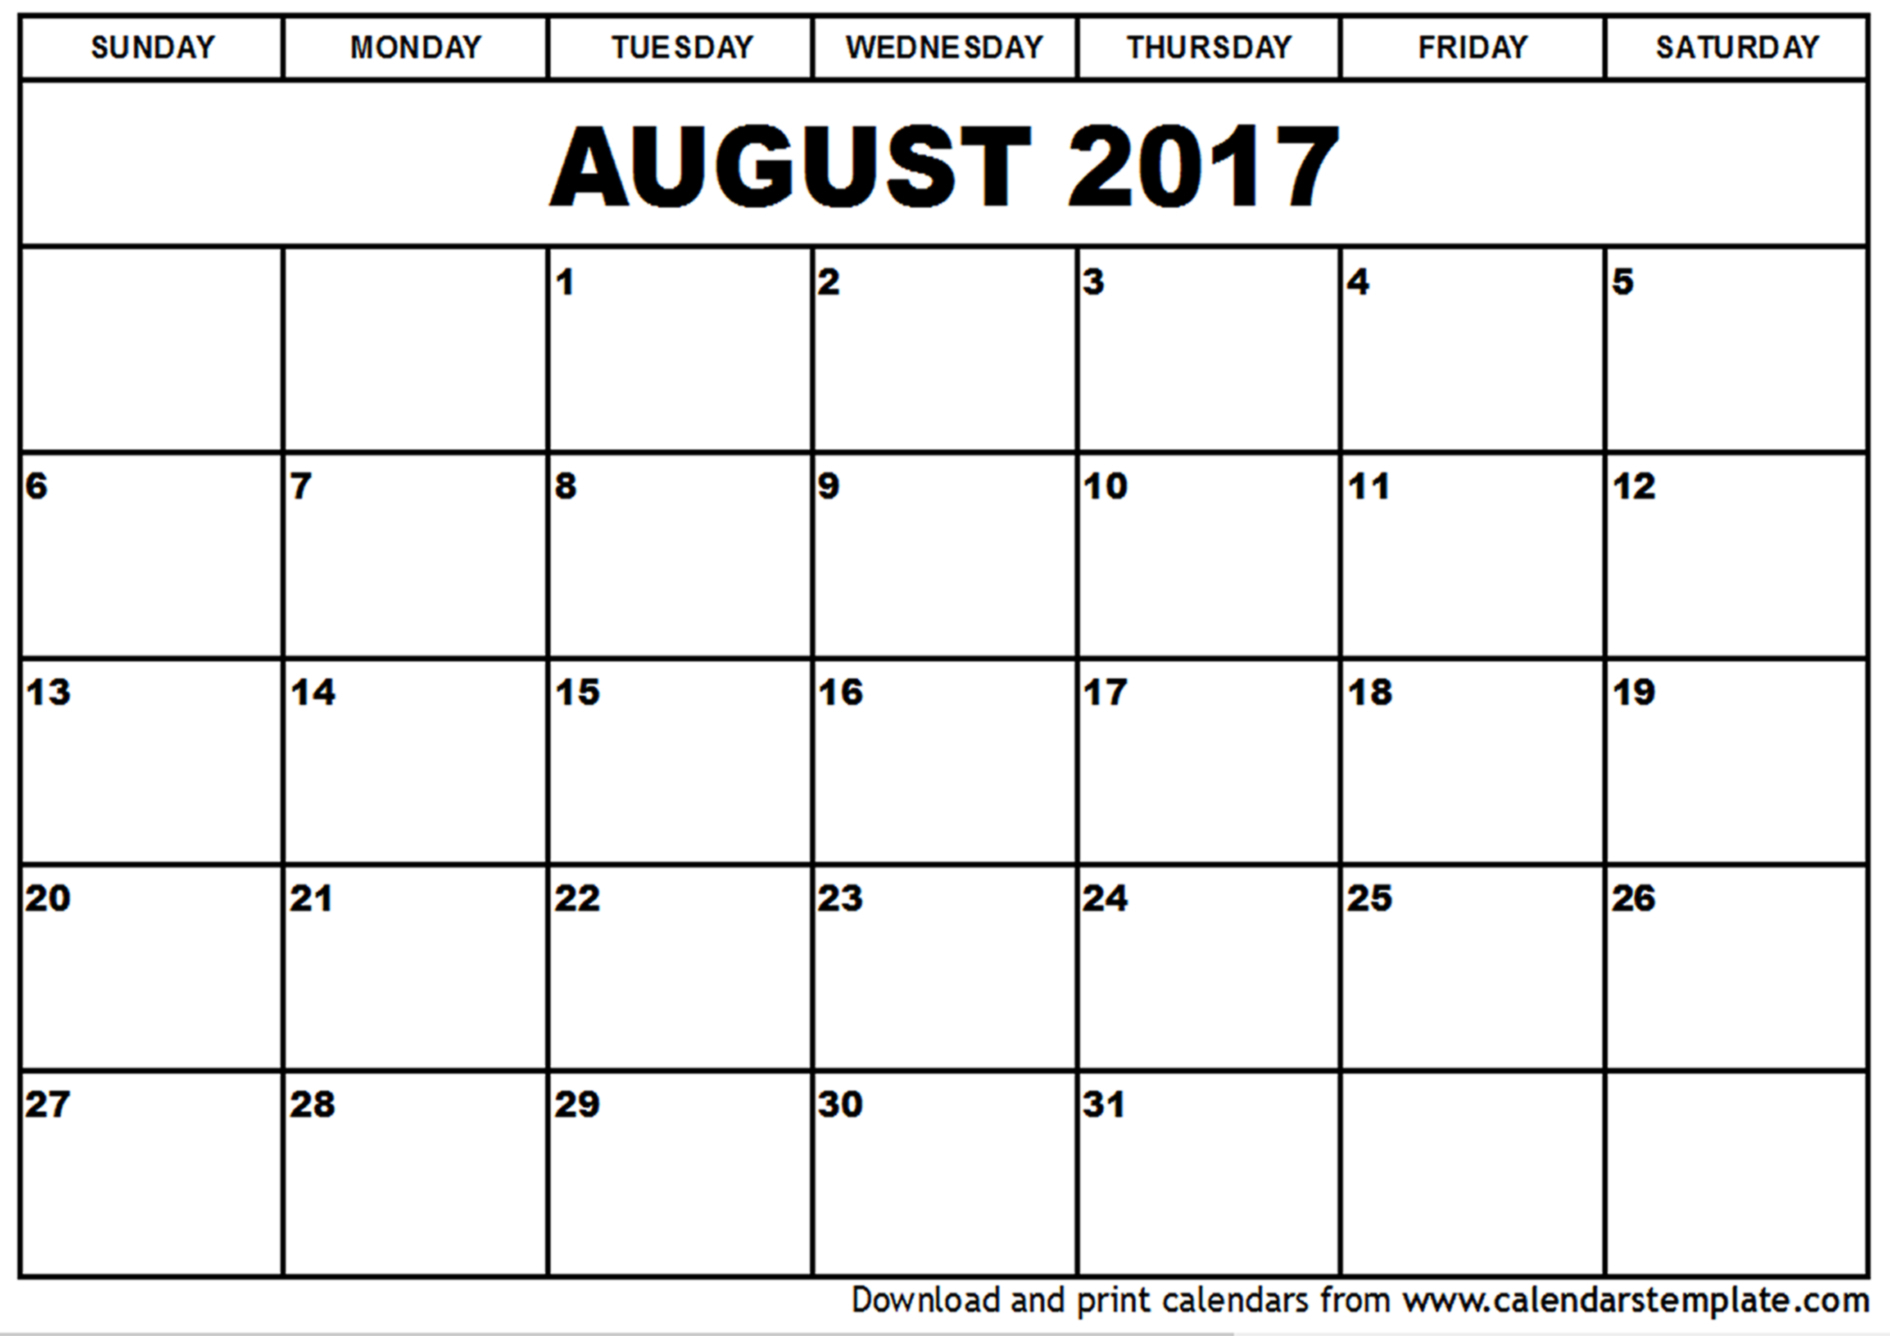 August 2017 Calendar with regard to August Calendar Template Excel